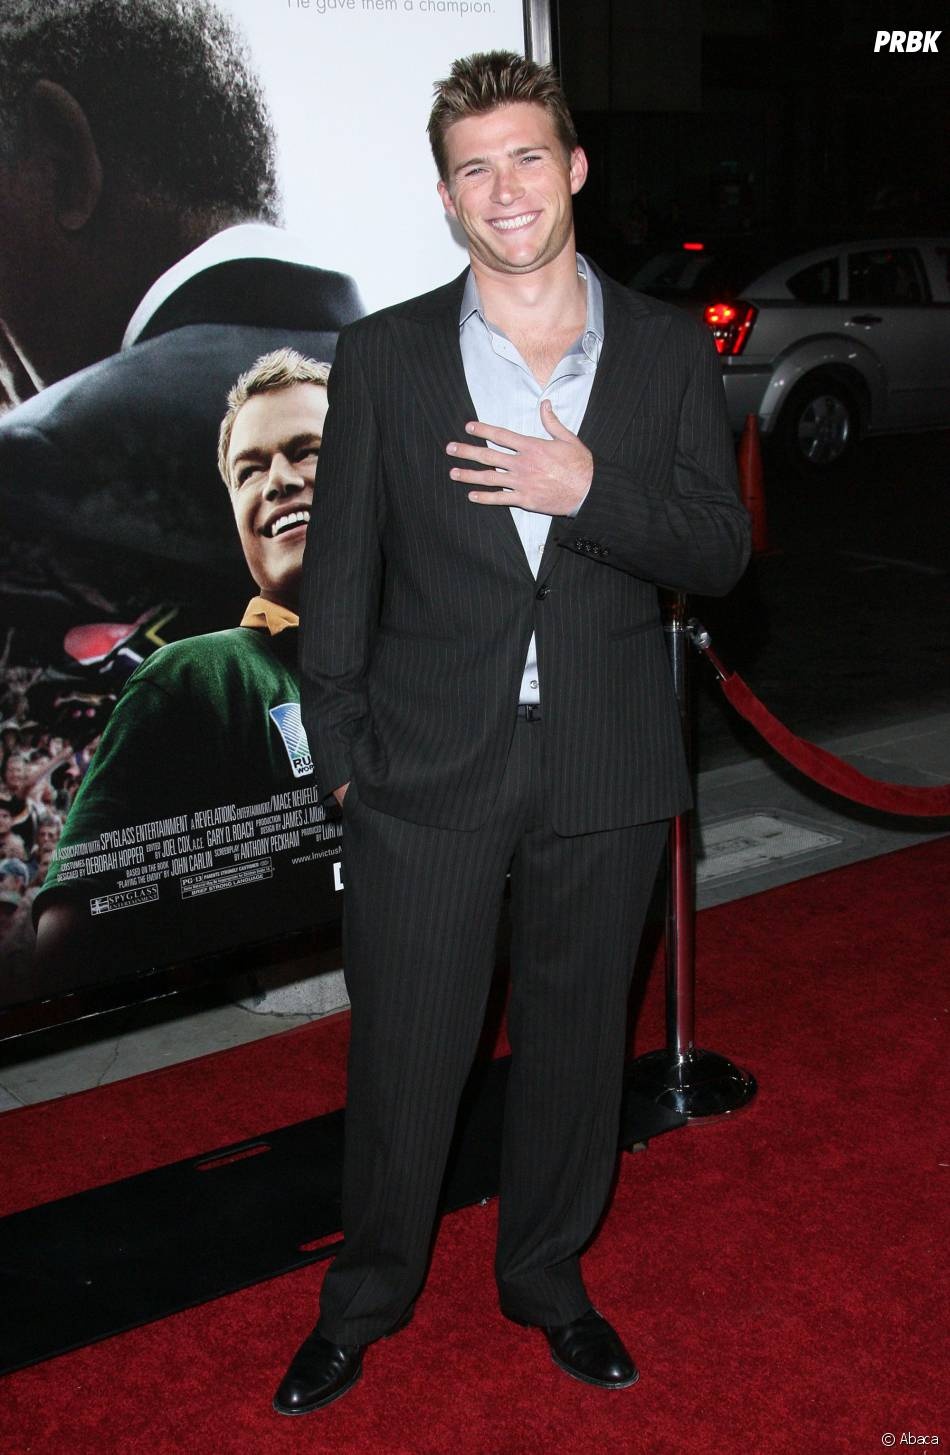 Scott Eastwood, fils de Clint Eastwood et nouvel bombe d'Hollywoood